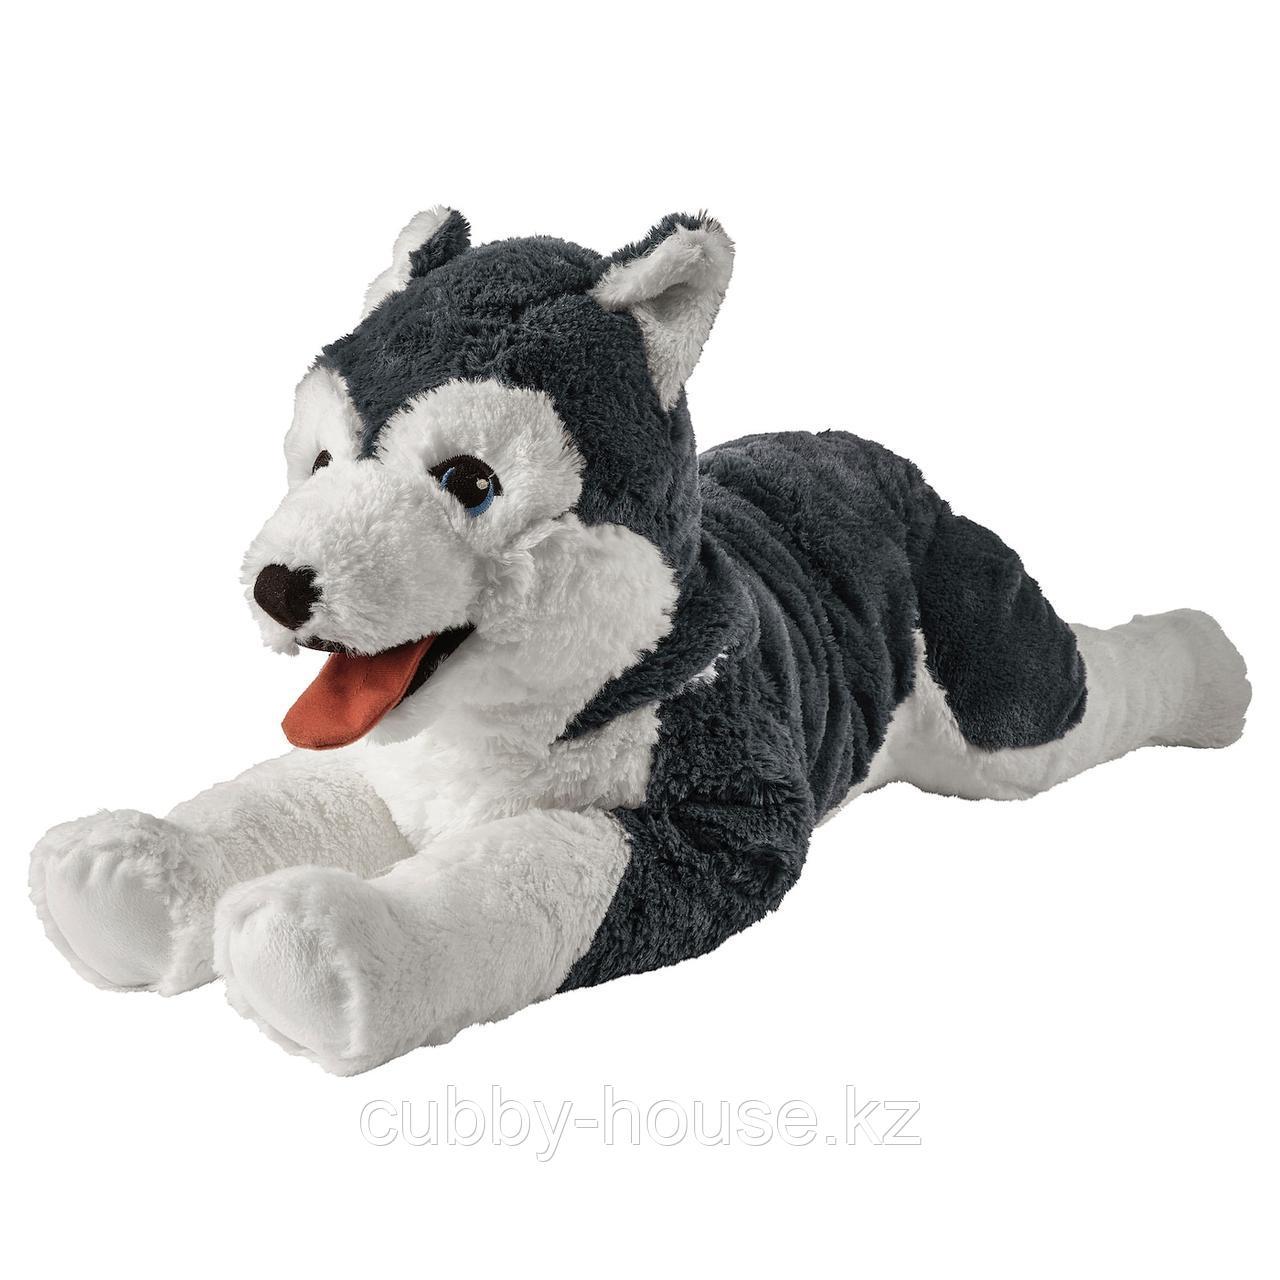 ЛИВЛИГ Мягкая игрушка, собака хаски, сибирский хаски, 57 см